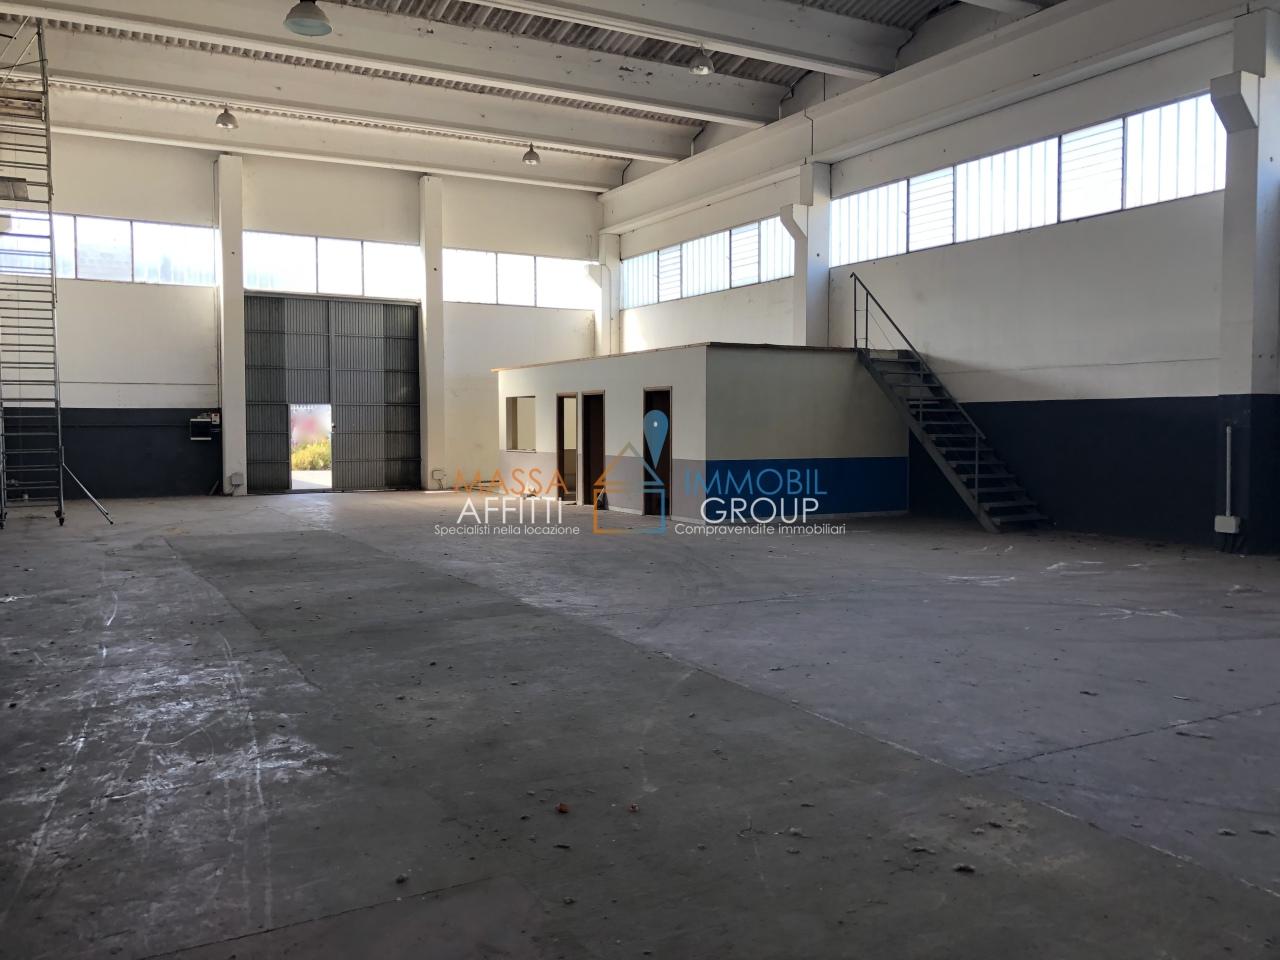 Capannone / Fondo - Industriale/Artigianale a Avenza, Carrara Rif. 8282593